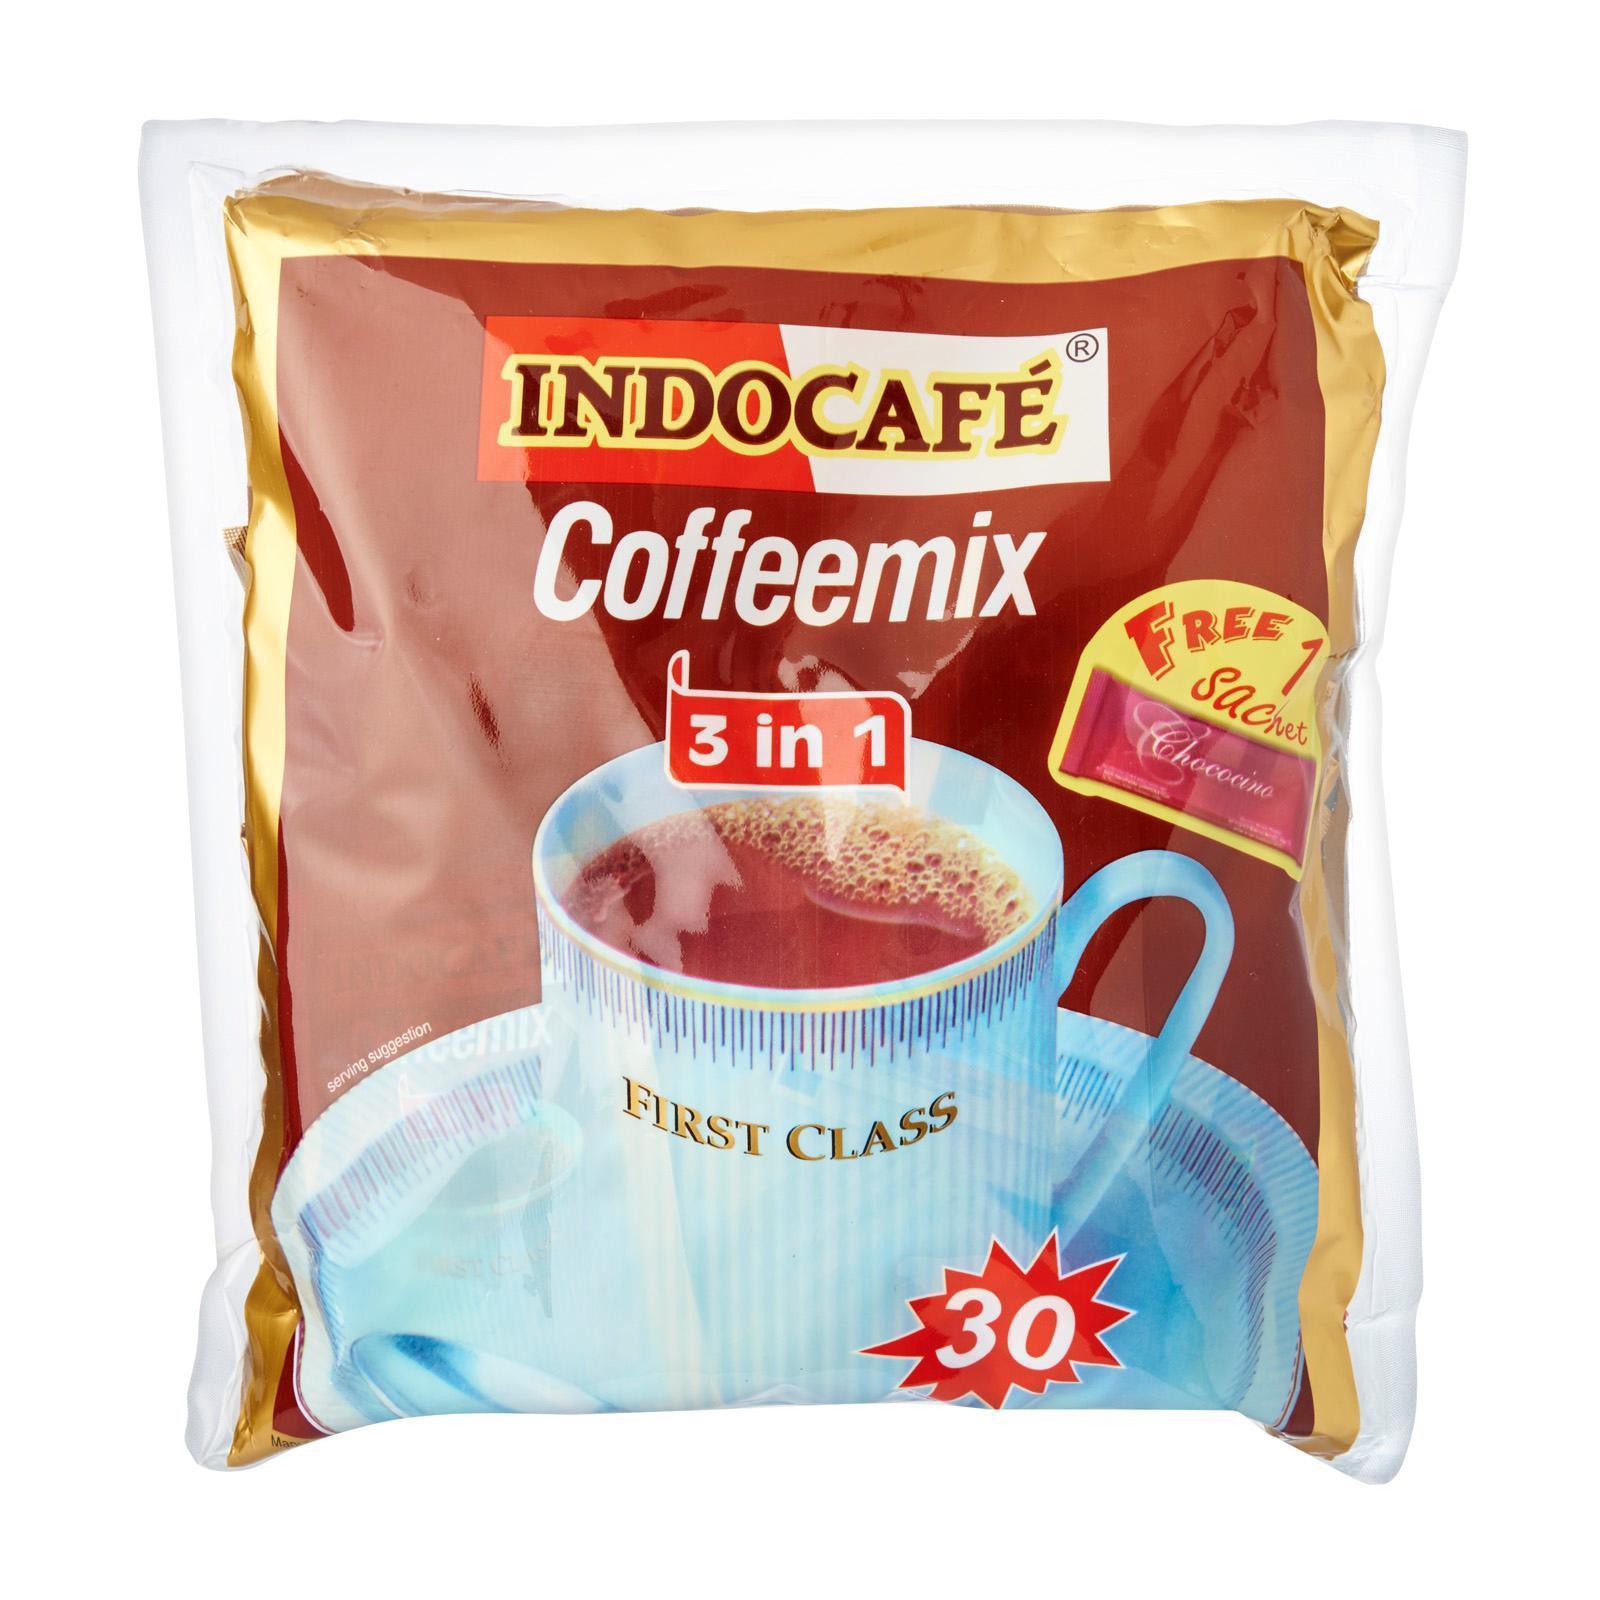 Indocafé 3 In 1 Coffeemix By Redmart.